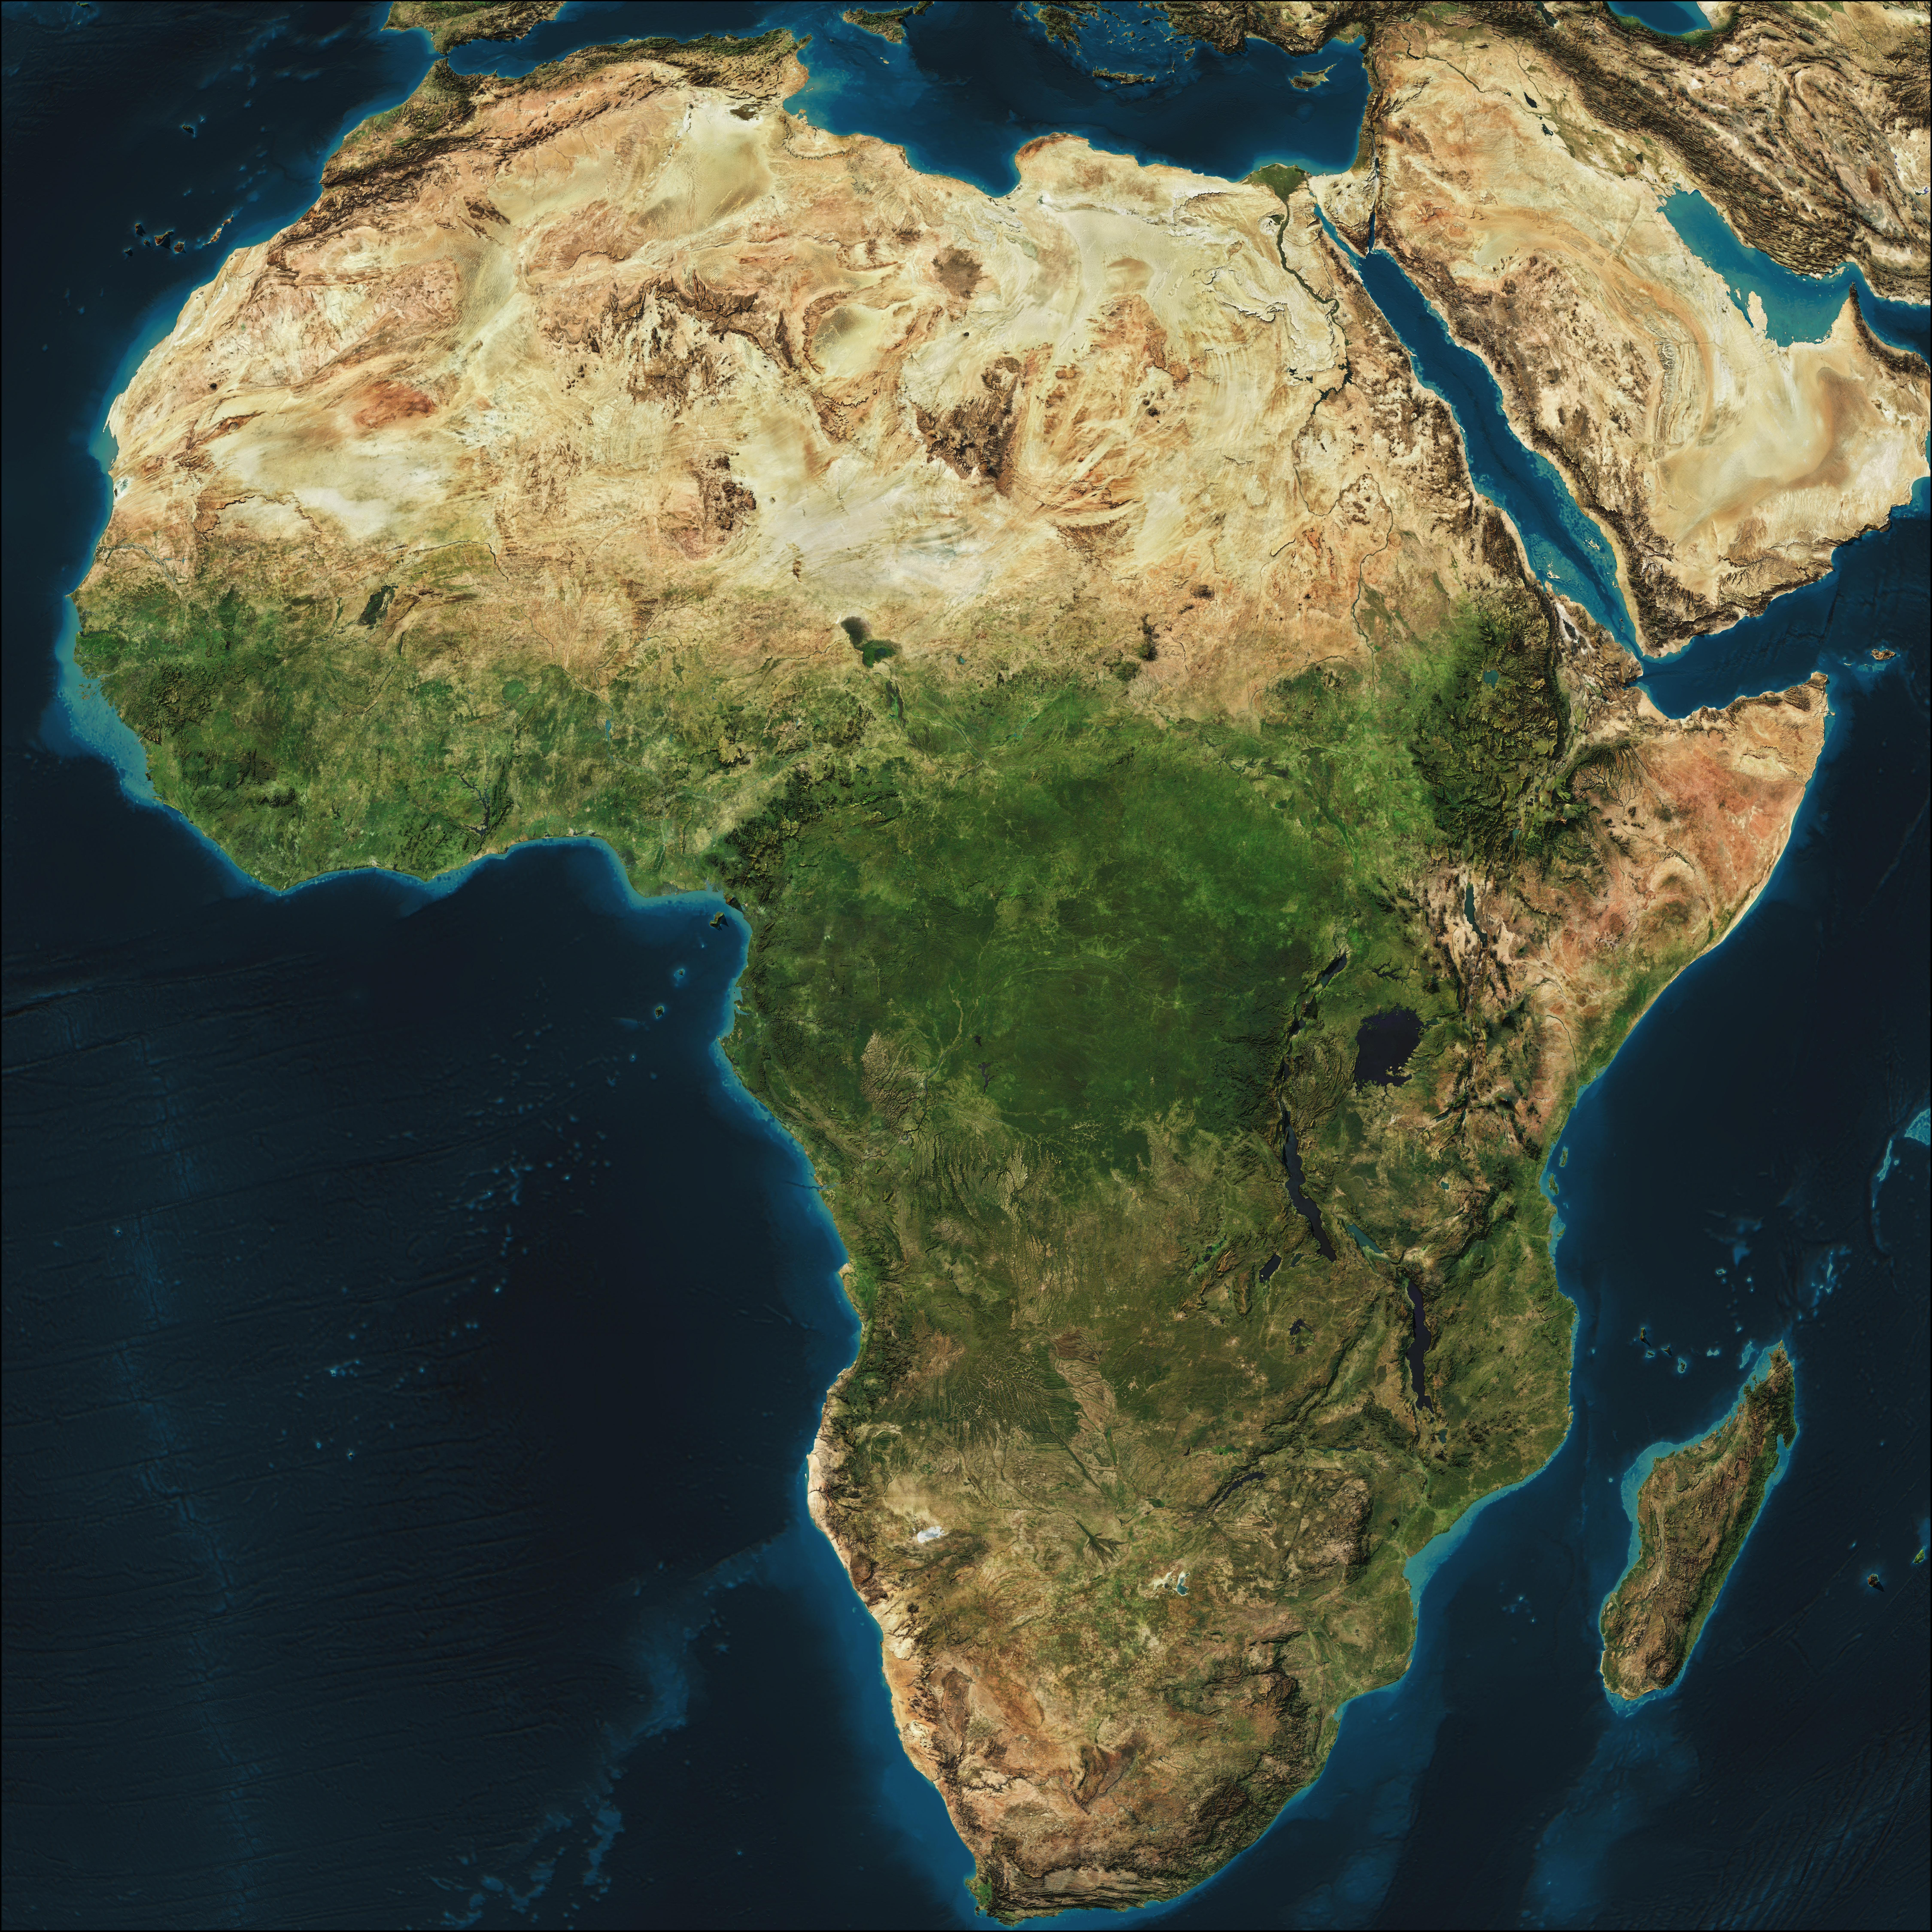 фото африканского континента из космоса каким законам